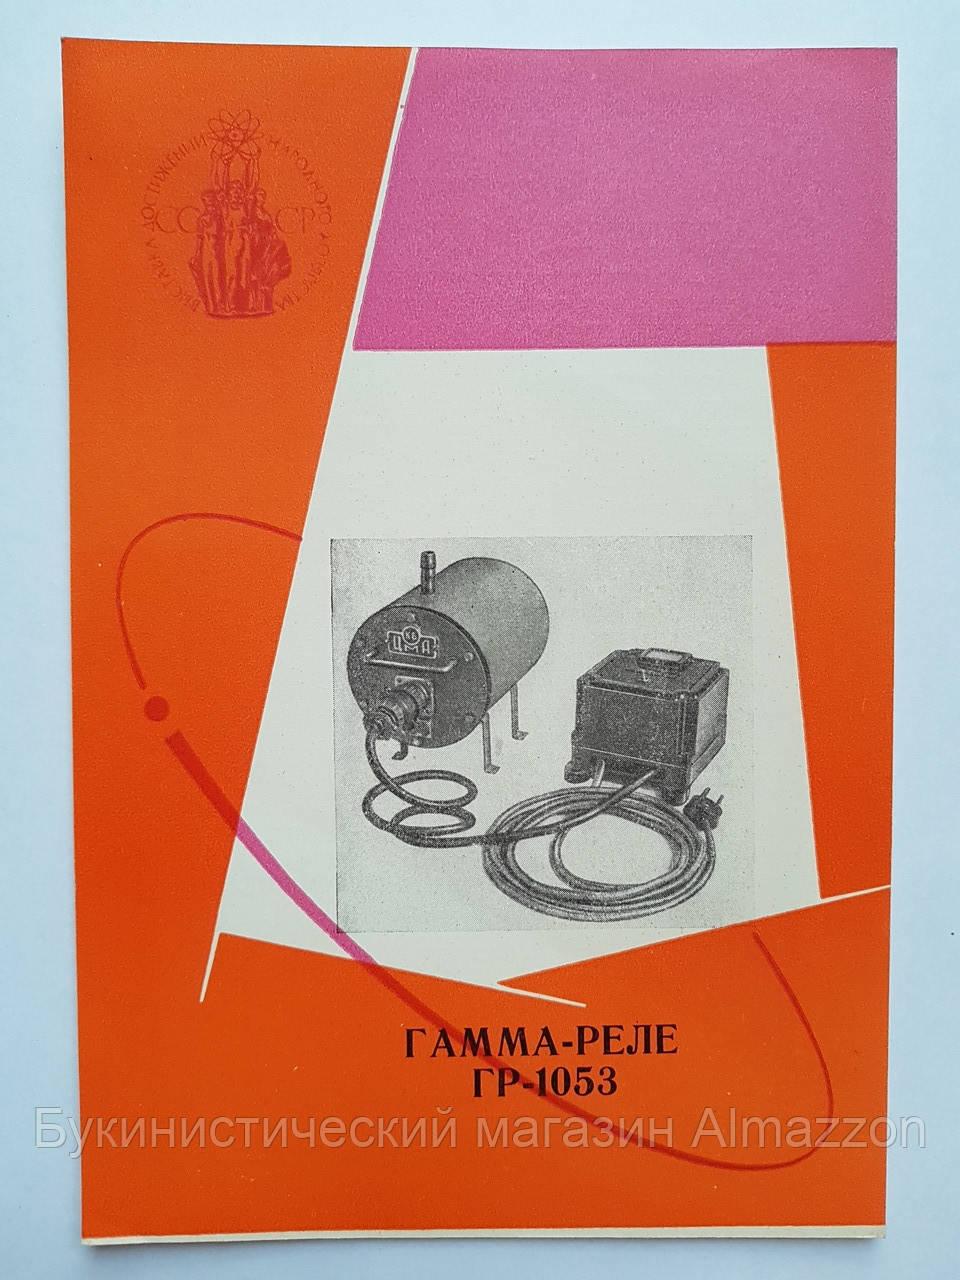 Реклама ВДНХ Гамма-реле ГР-1053.